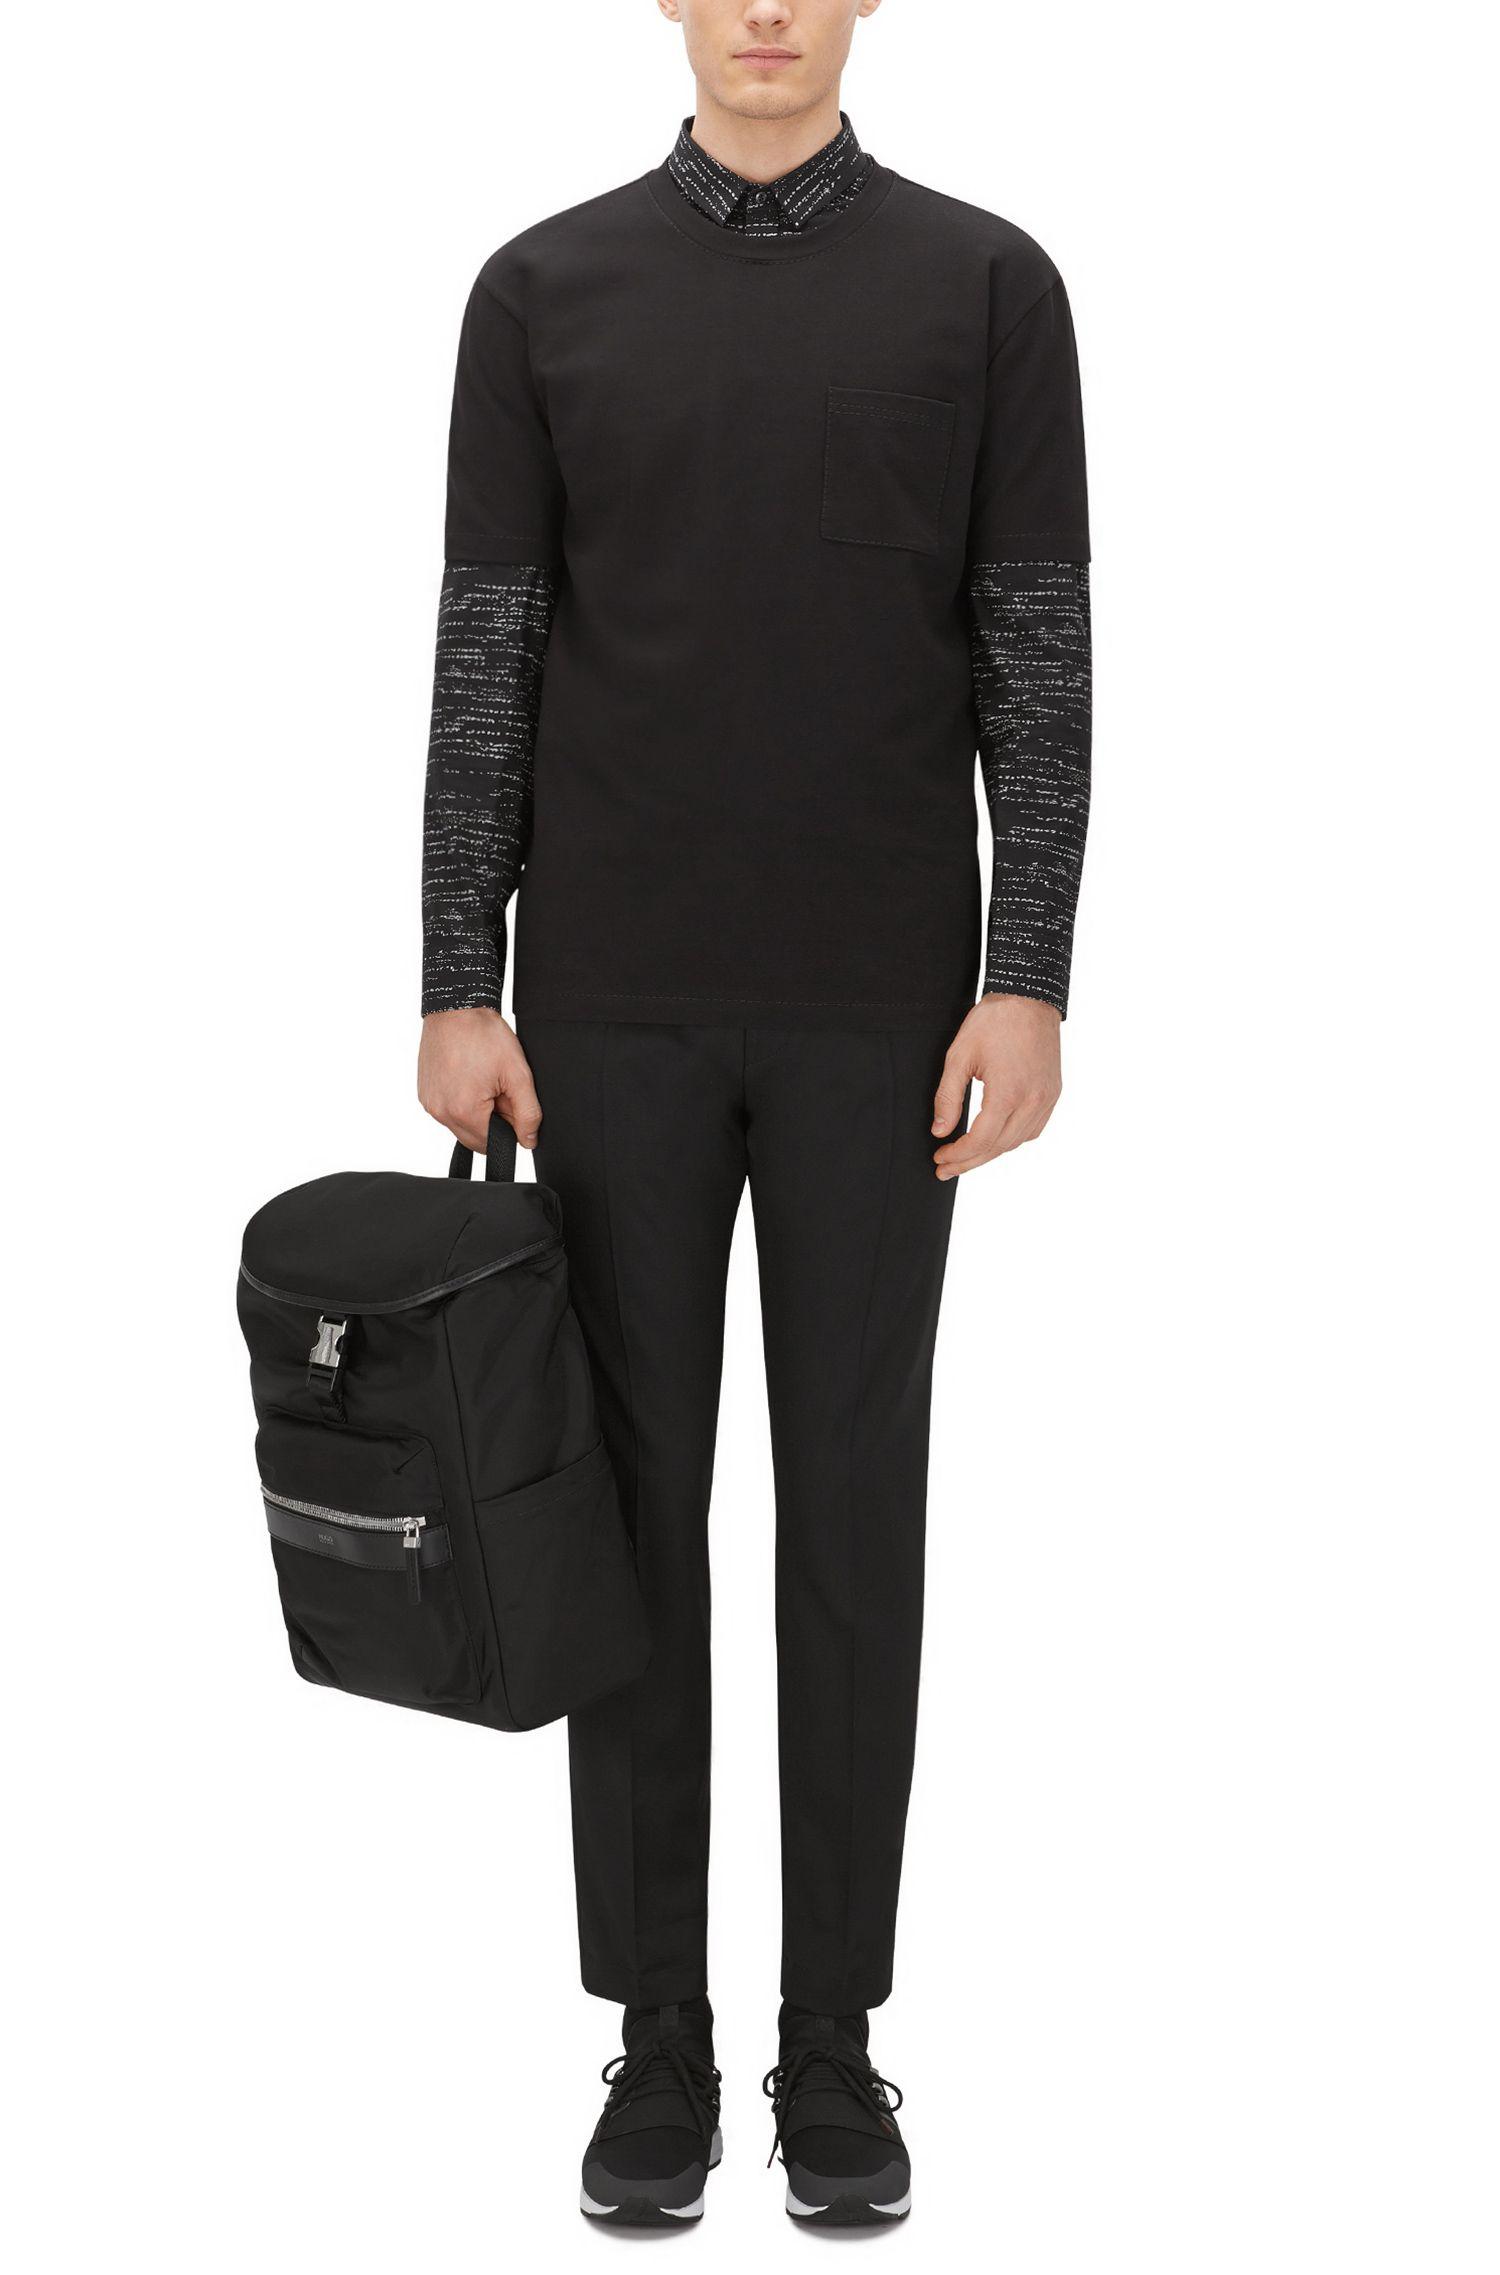 Stretch French Terry Pocket T-Shirt   Daccor, Black